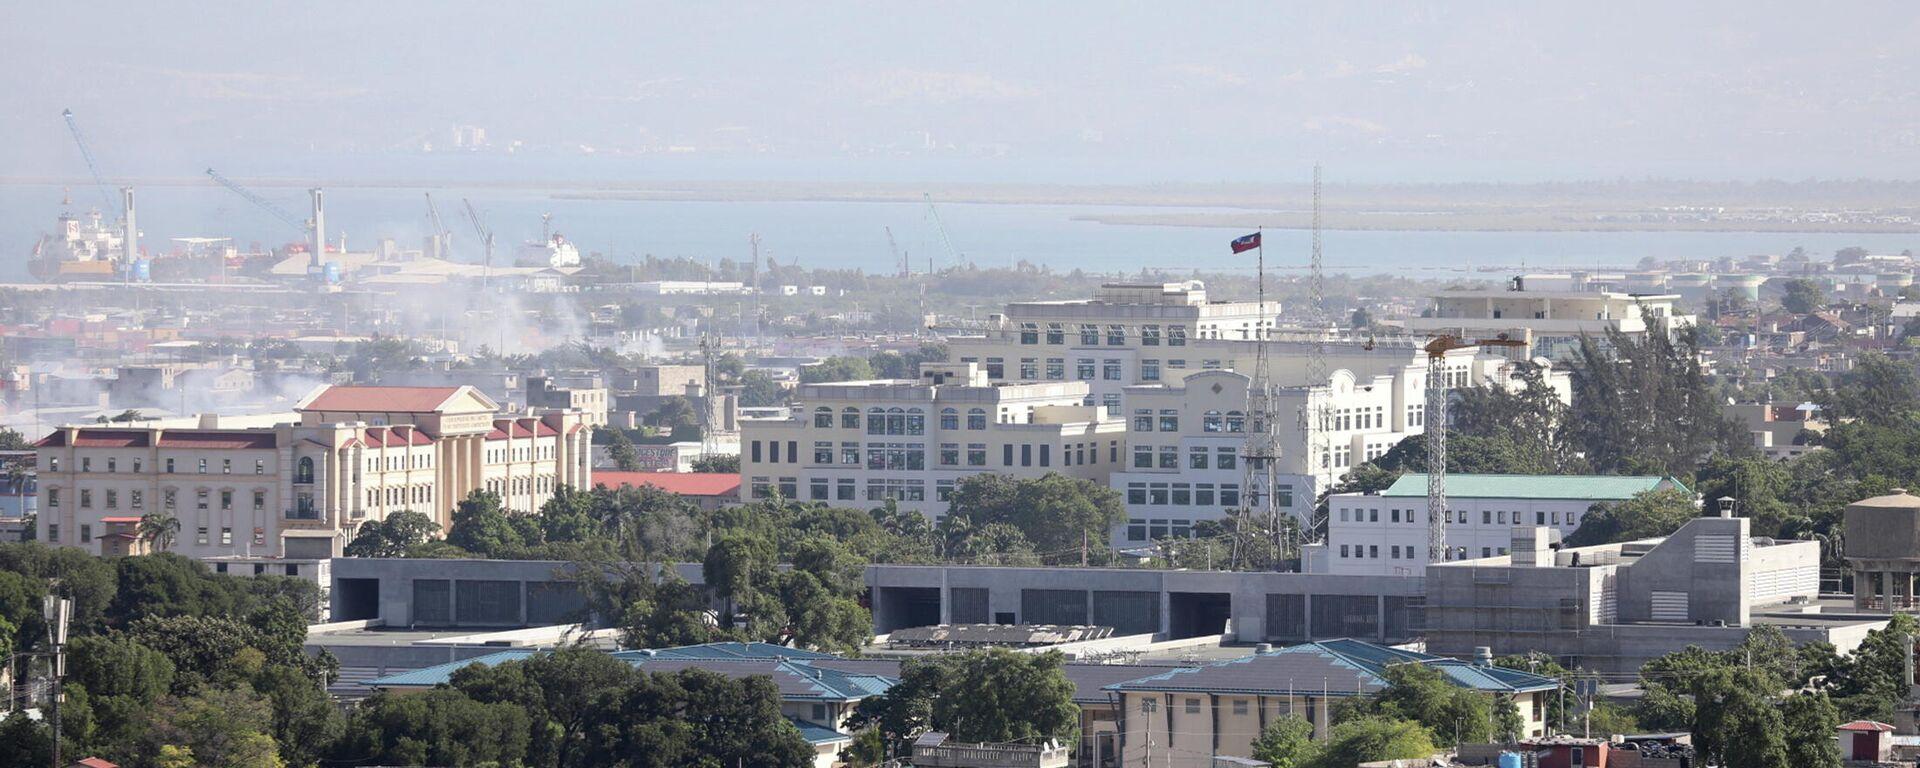 Palacio Presidencial de Puerto Príncipe, Haití - Sputnik Mundo, 1920, 08.07.2021